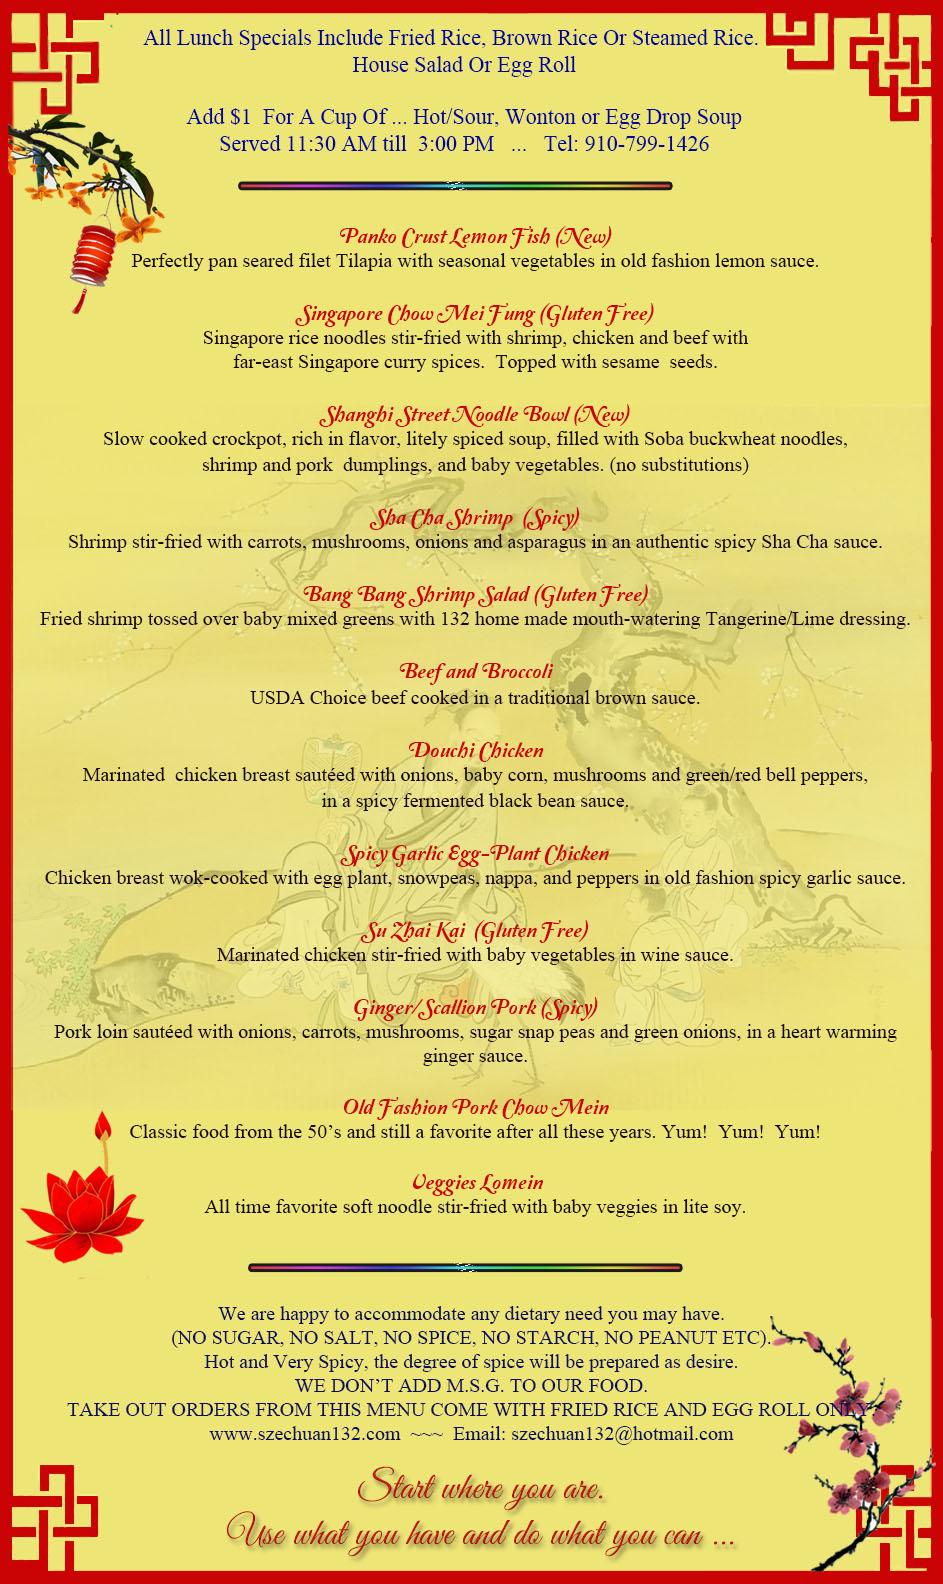 11-02-19 Lunch menu